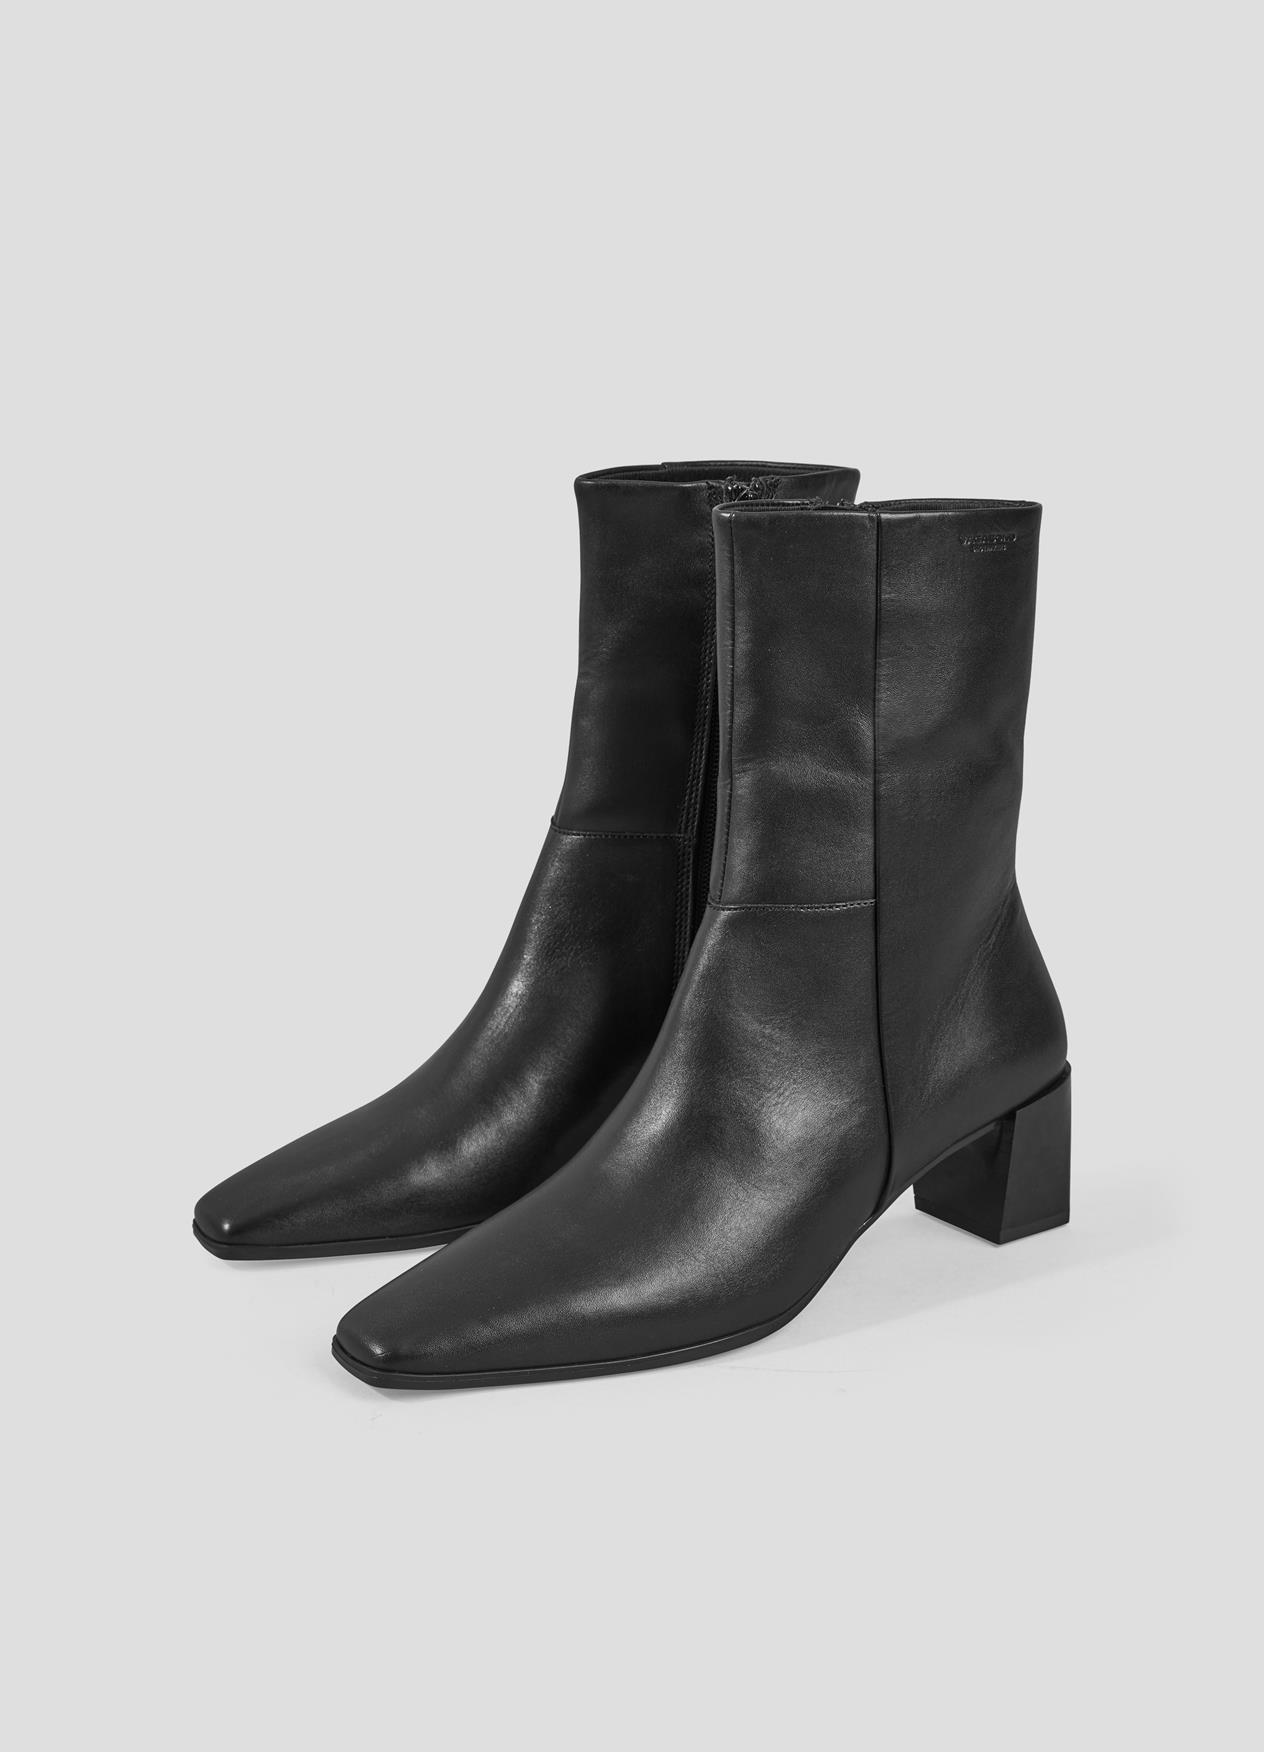 GABI BOOTS by Vagabond, available on vagabond.com for $115 Gigi Hadid Shoes Exact Product